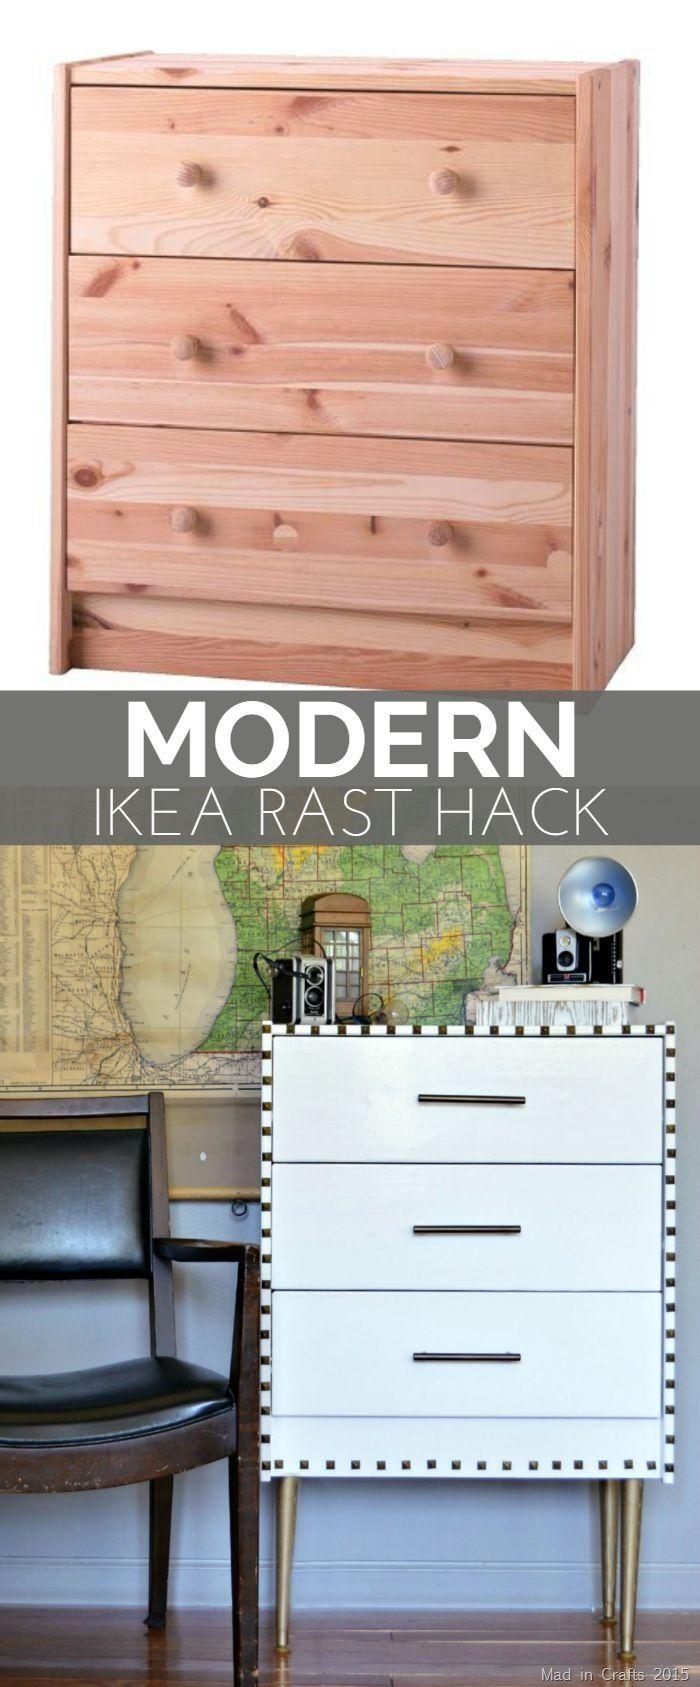 Modern Ikea Rast Hack Diy Ikea Hacks And Painted